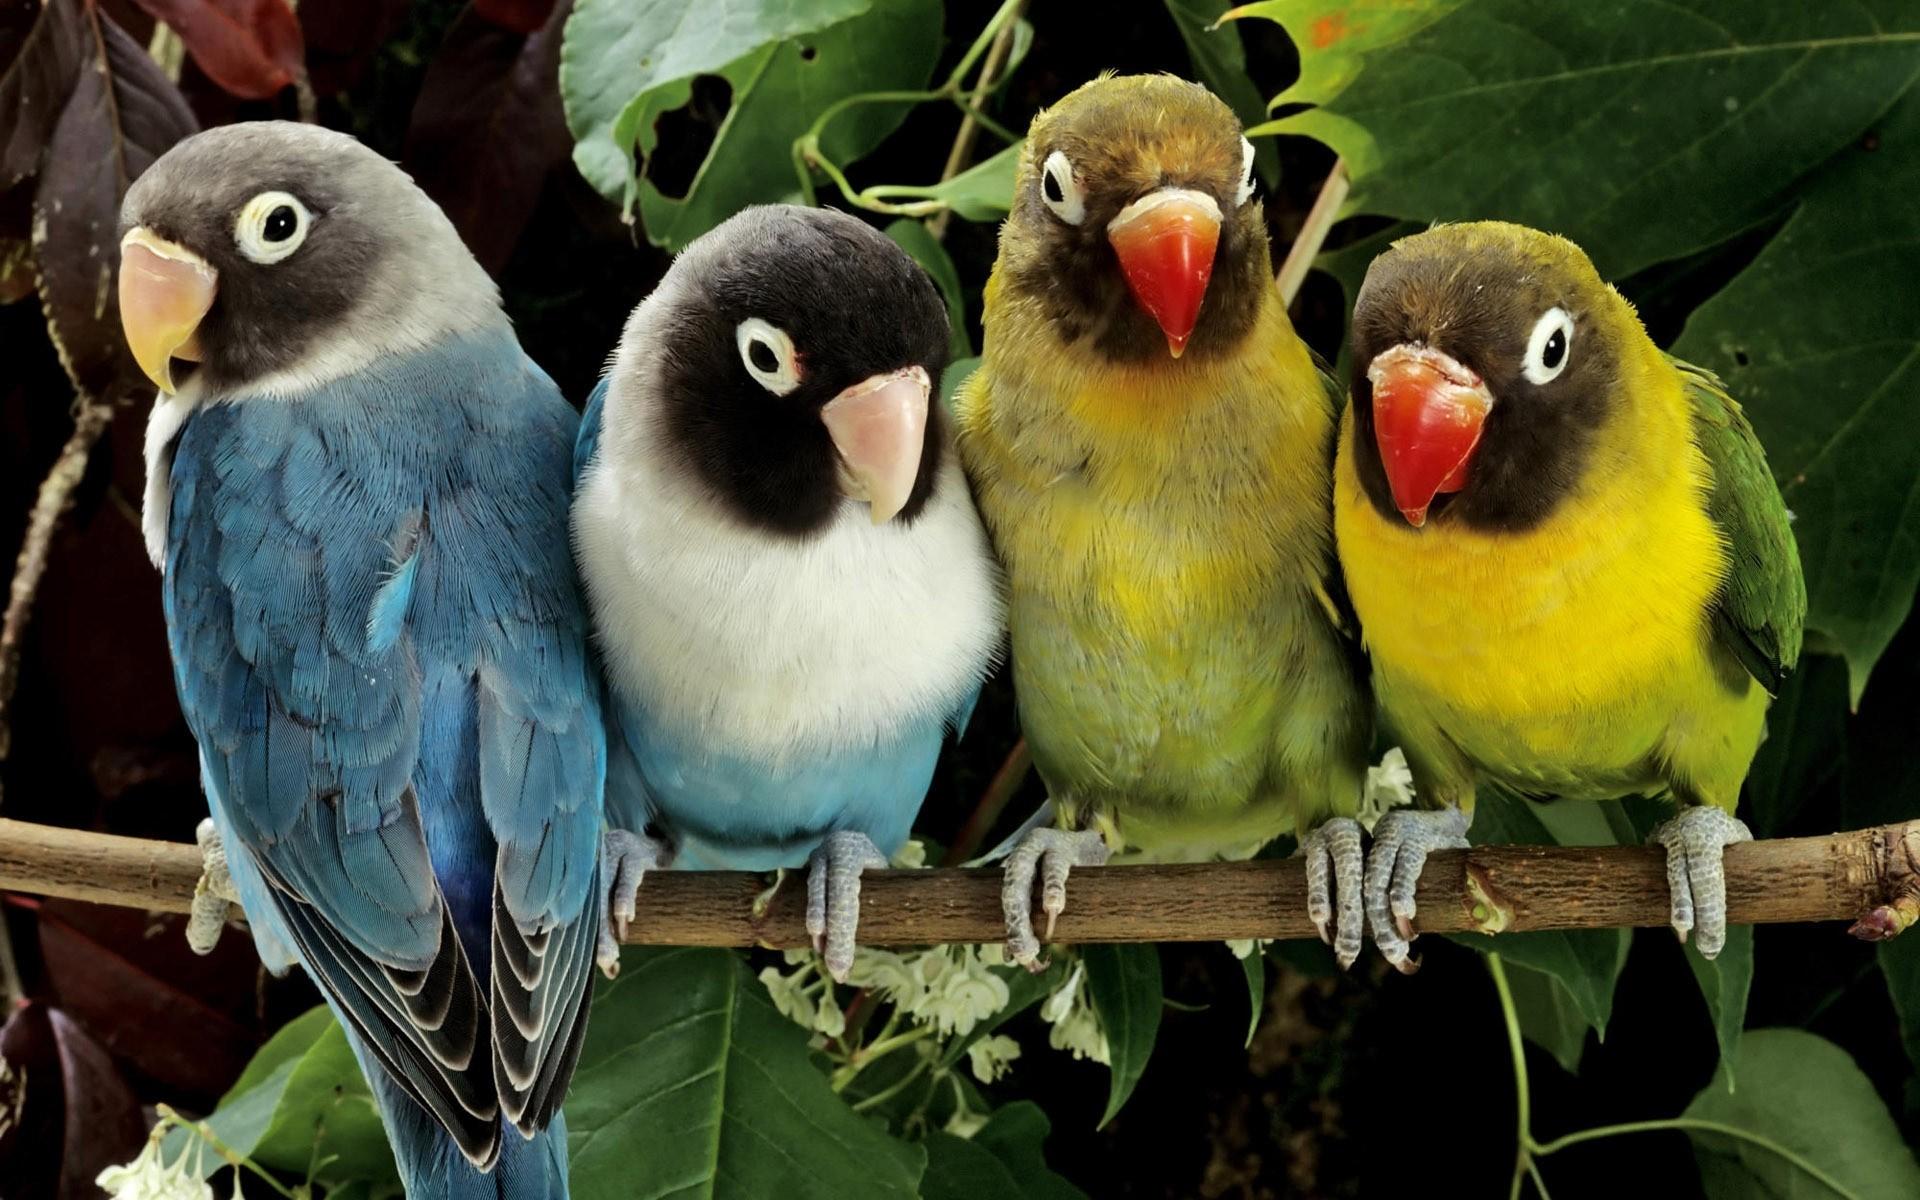 изображение птиц на фото картинках него